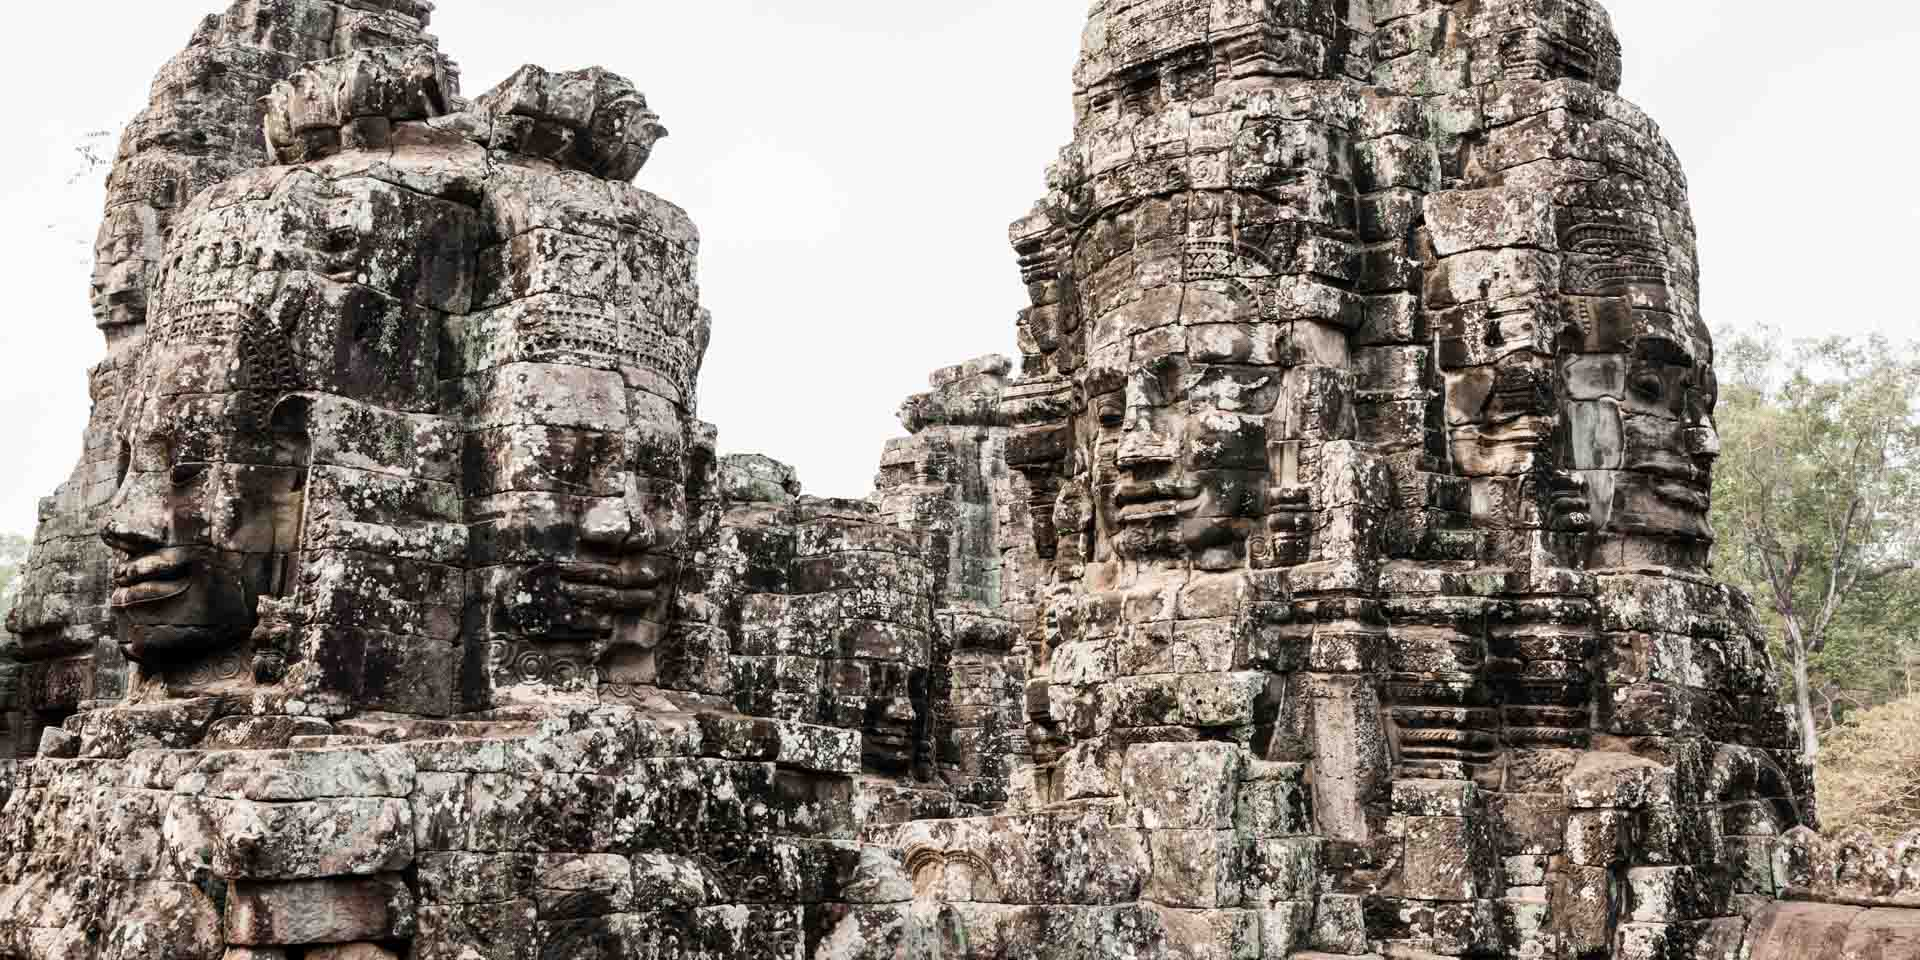 Faces of Cambodia - Angkor Thom